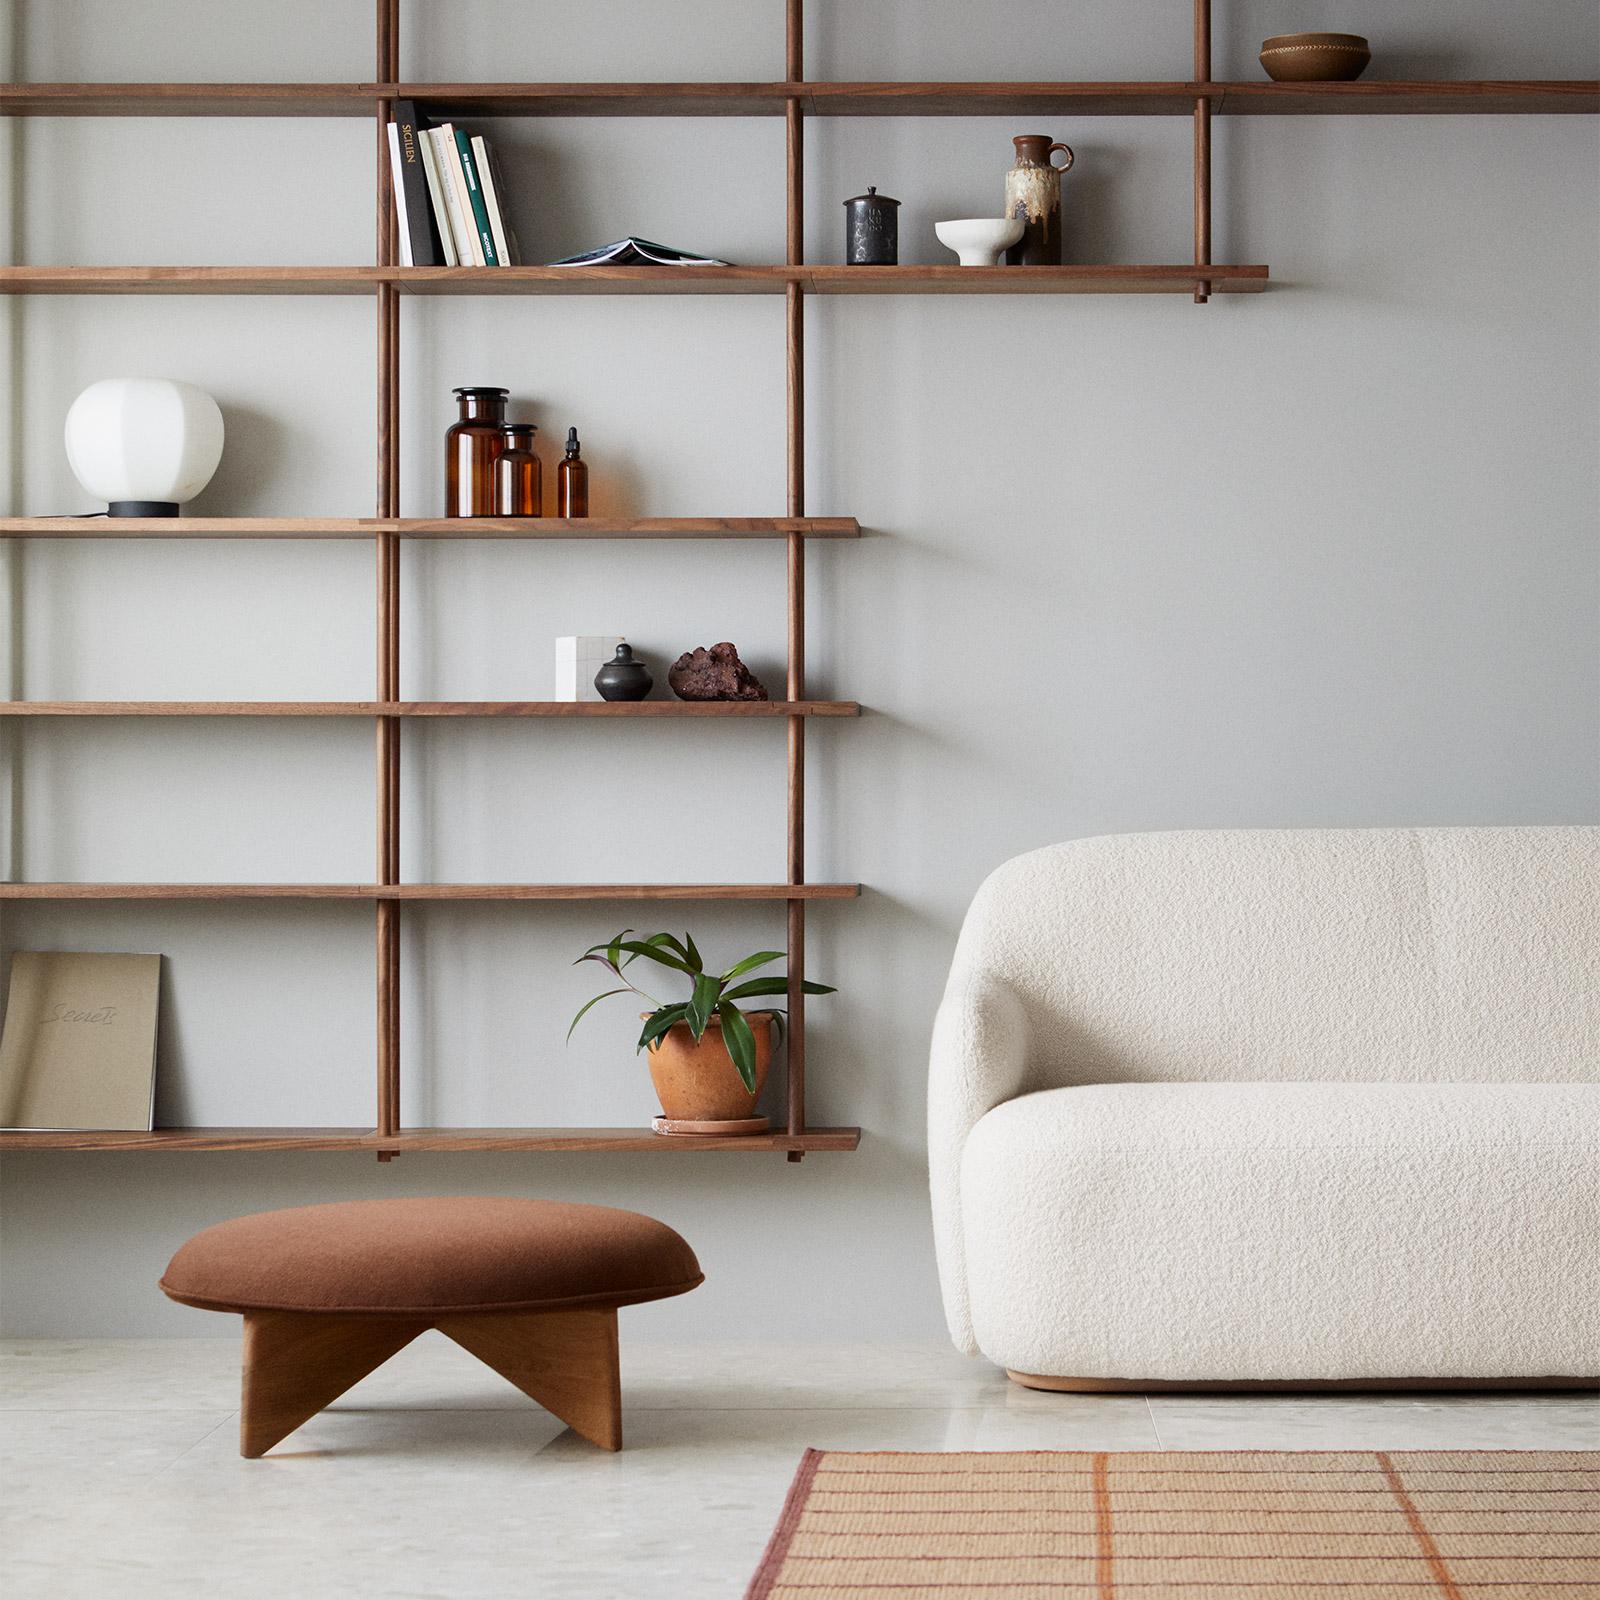 dark wooden shelves against a white wall with a modern white sofa